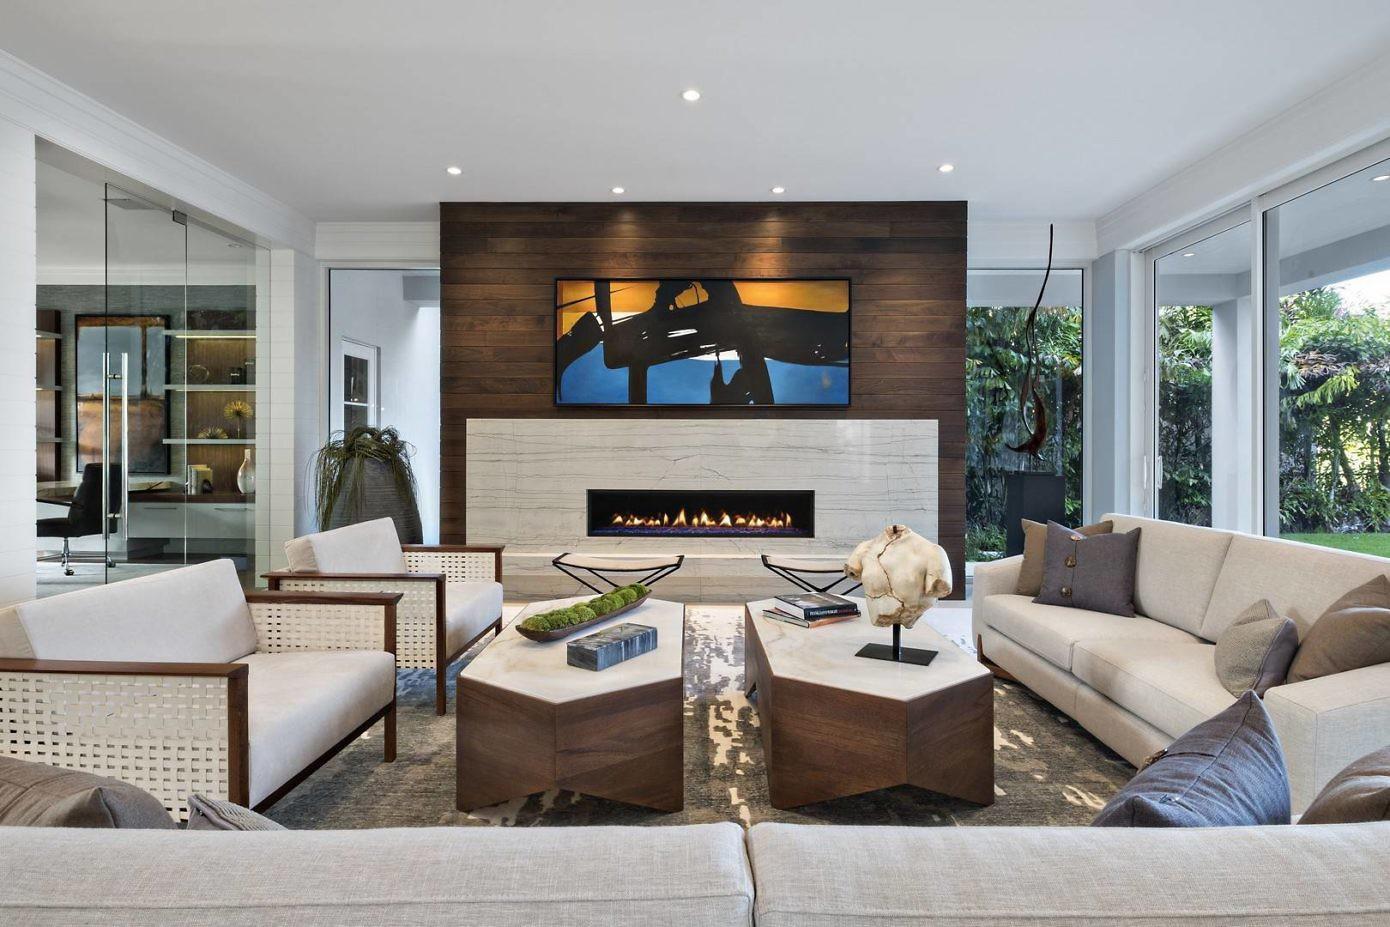 captivating contemporary coastal interior design | Coastal Contemporary by The Decorators Unlimited | HomeAdore